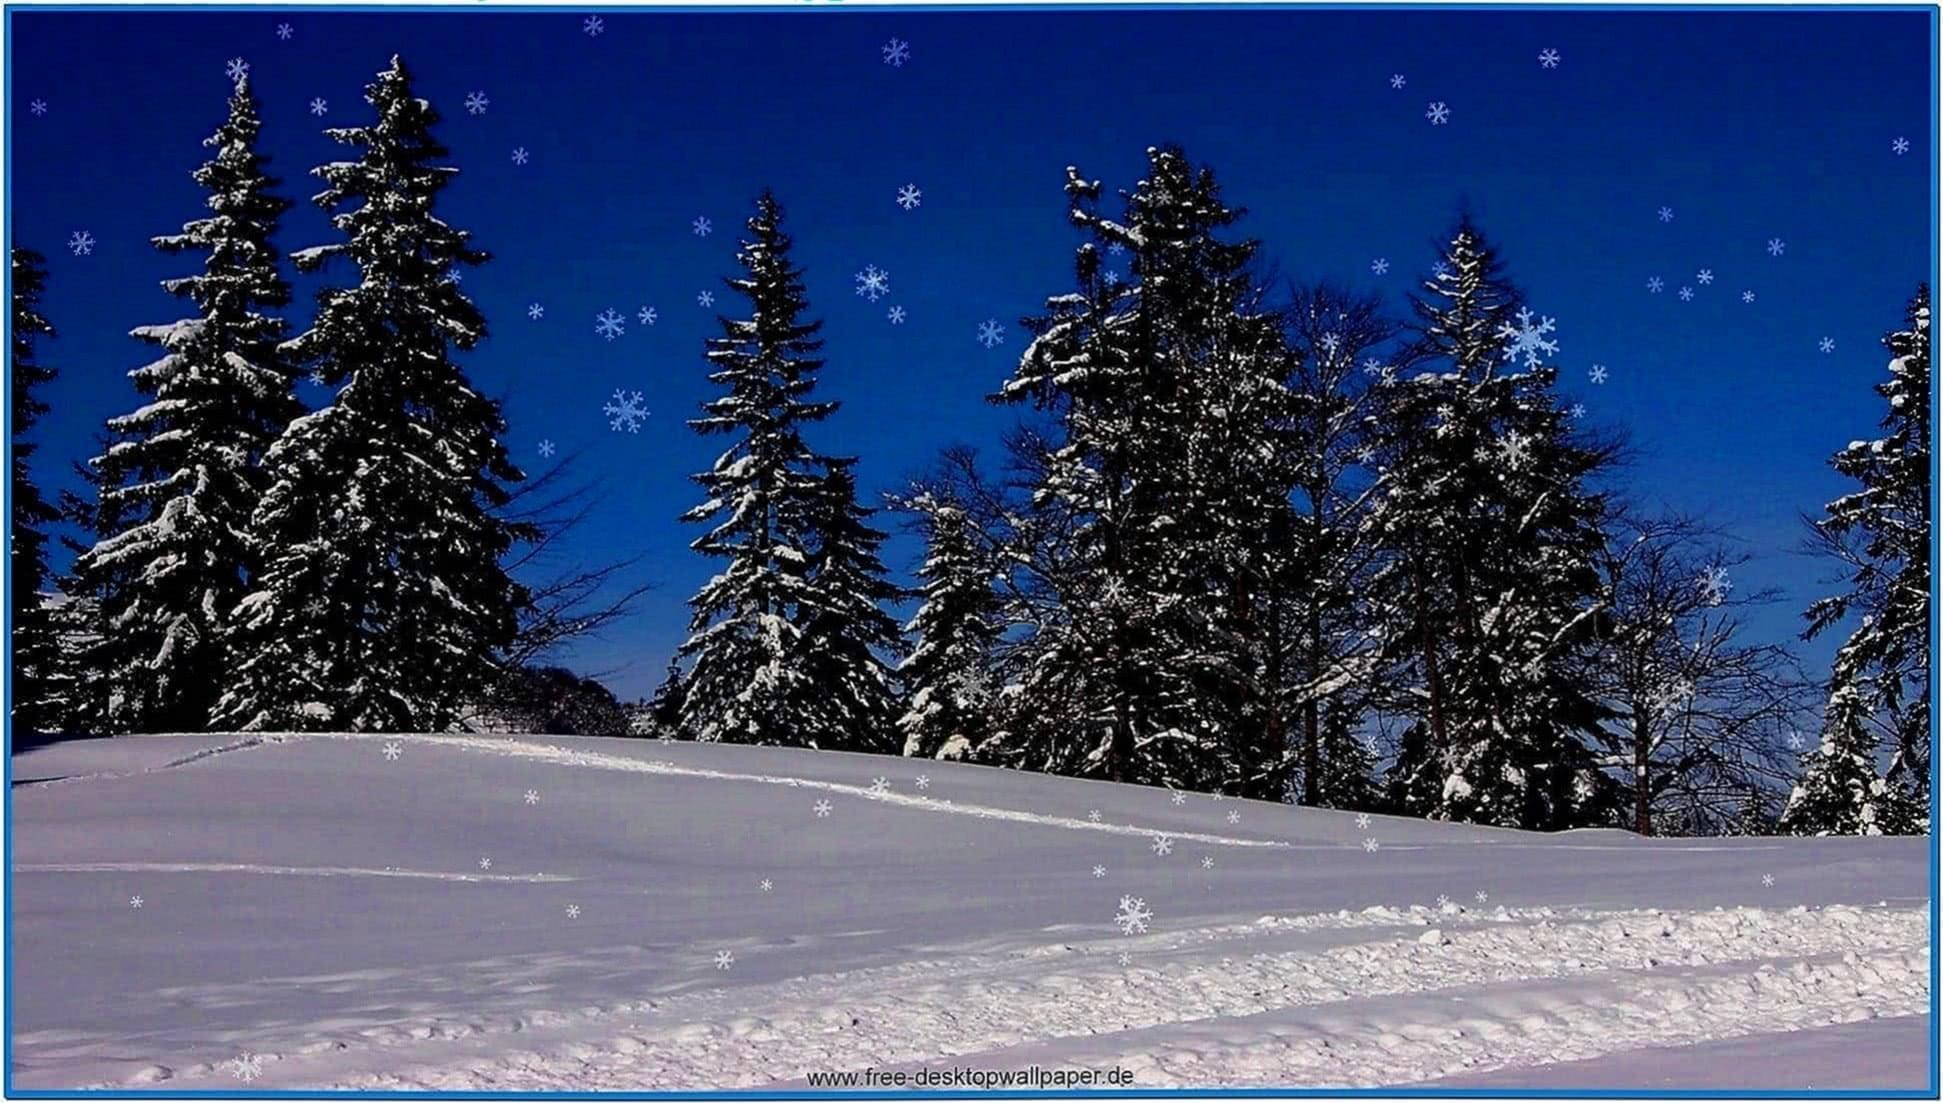 Christmas snow screensaver 02 - Download free